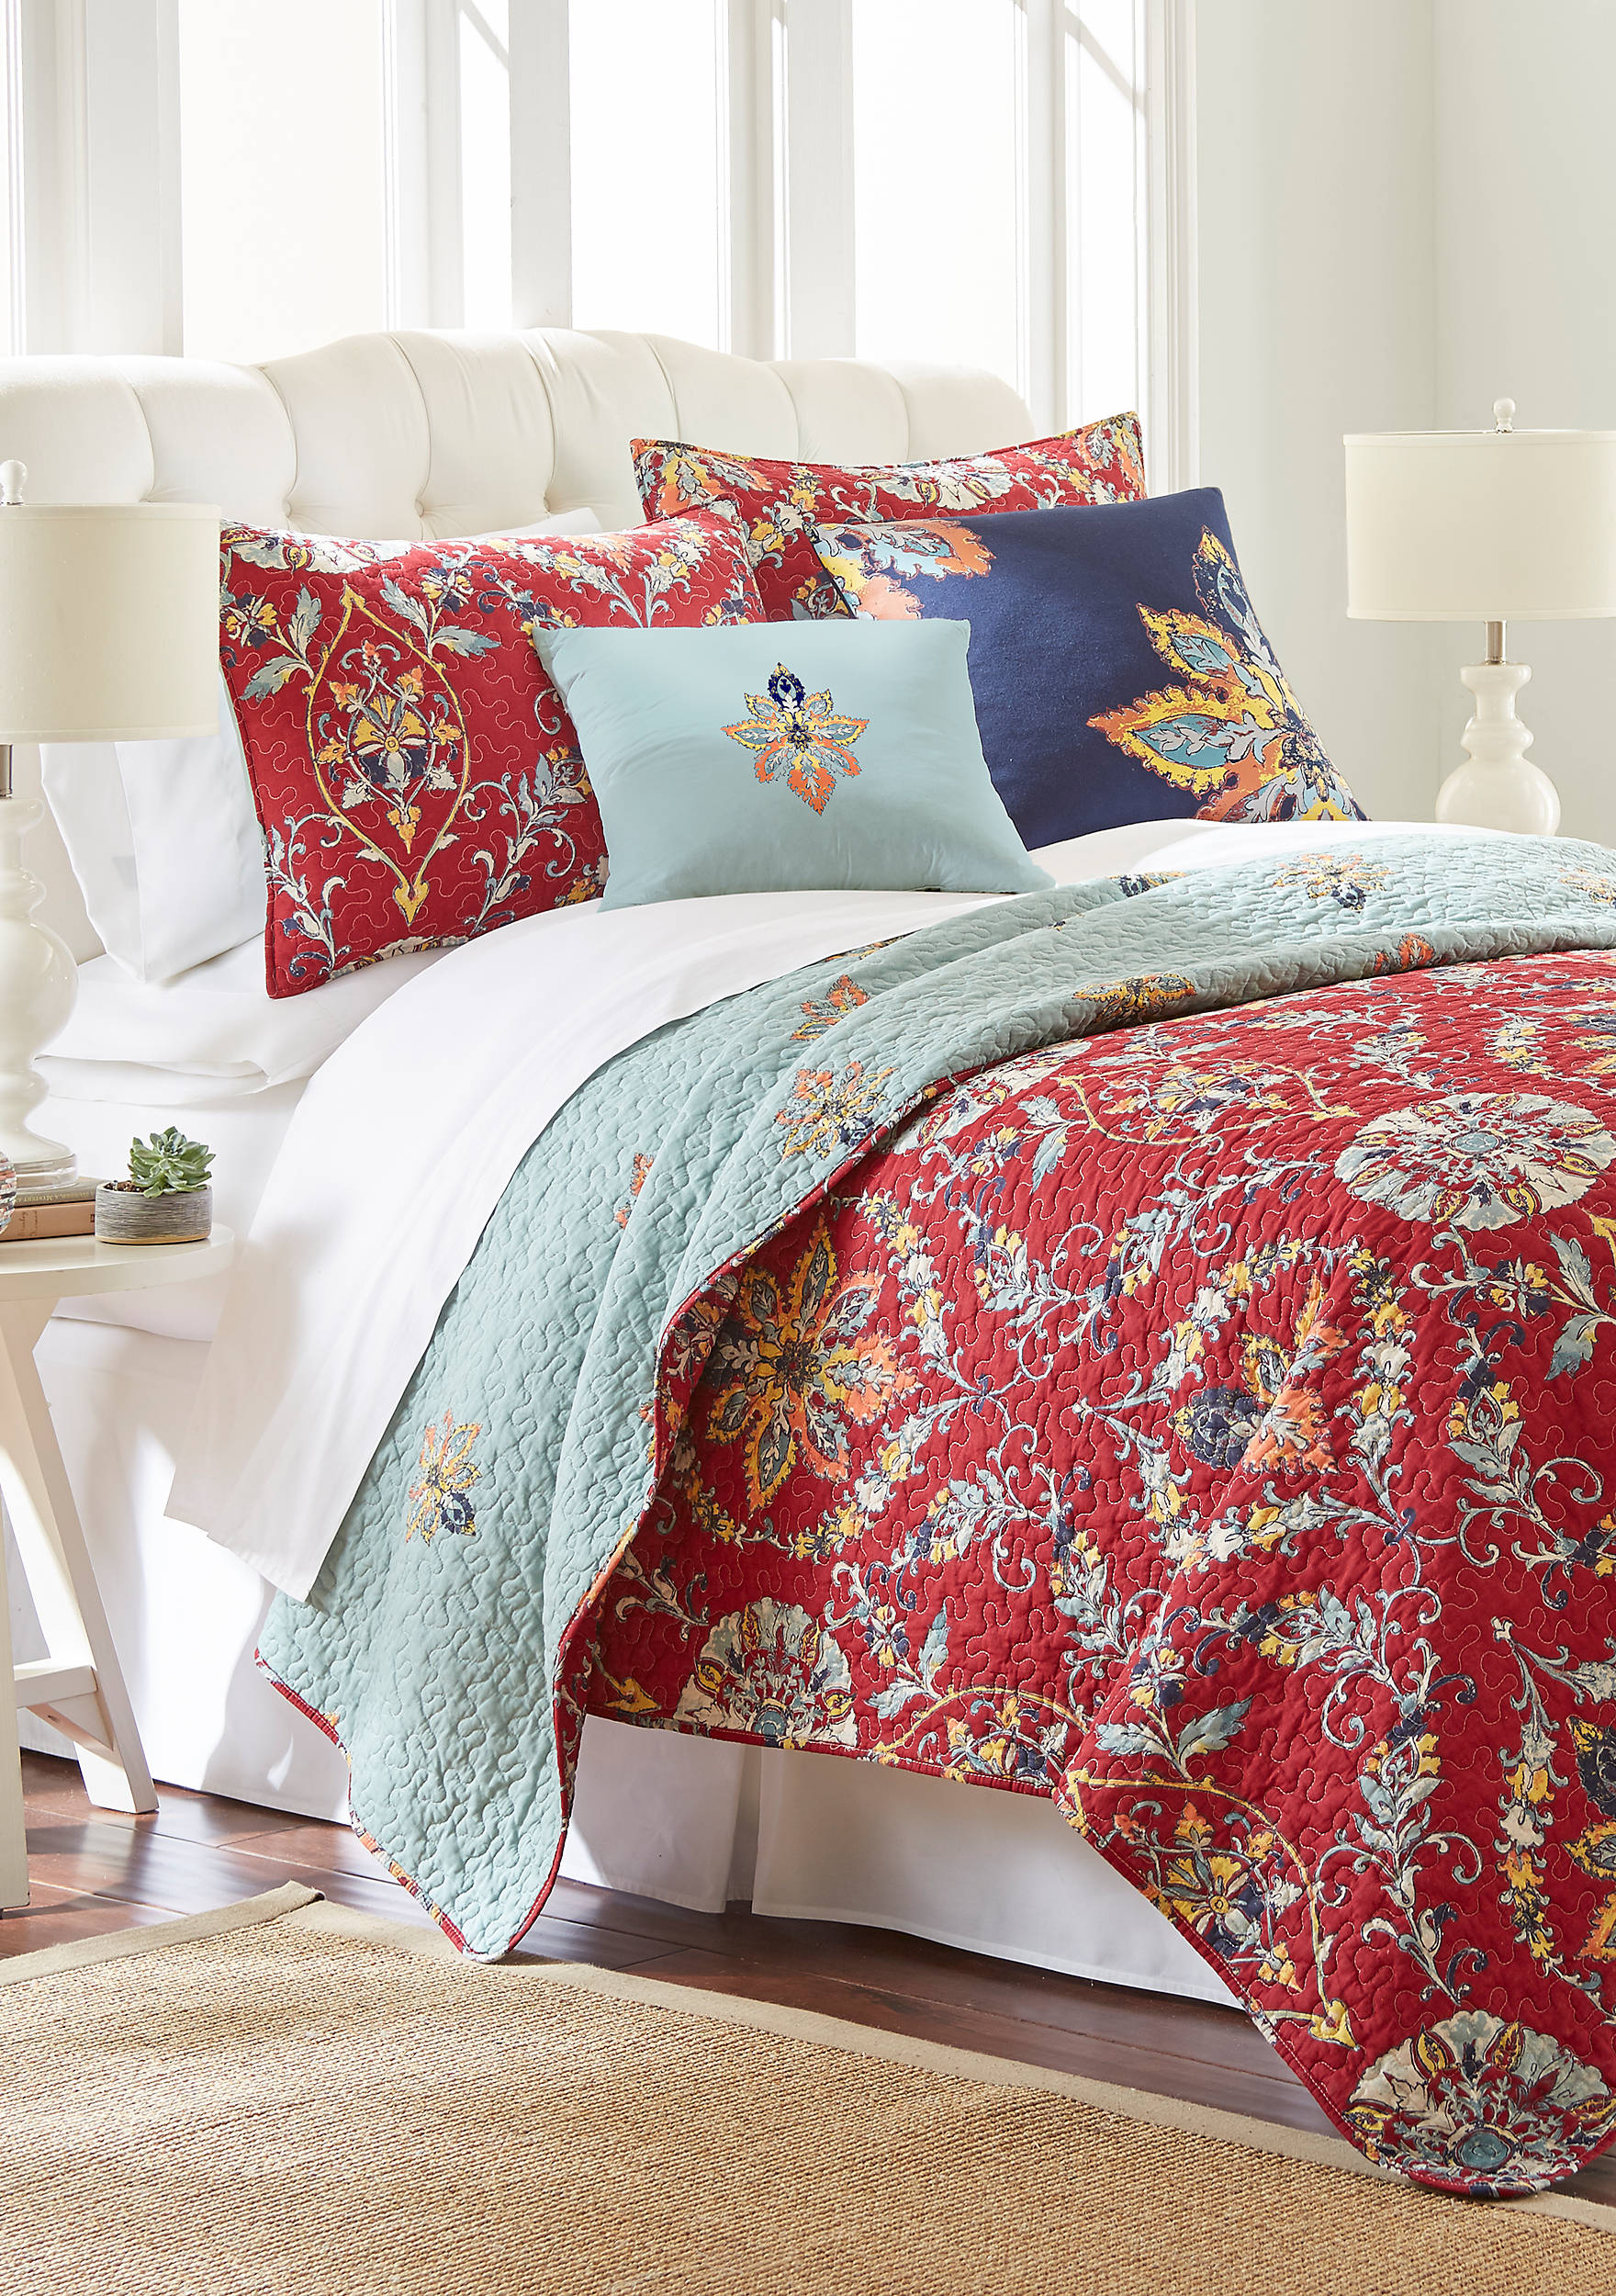 Quilts | belk : red quilts bedding - Adamdwight.com